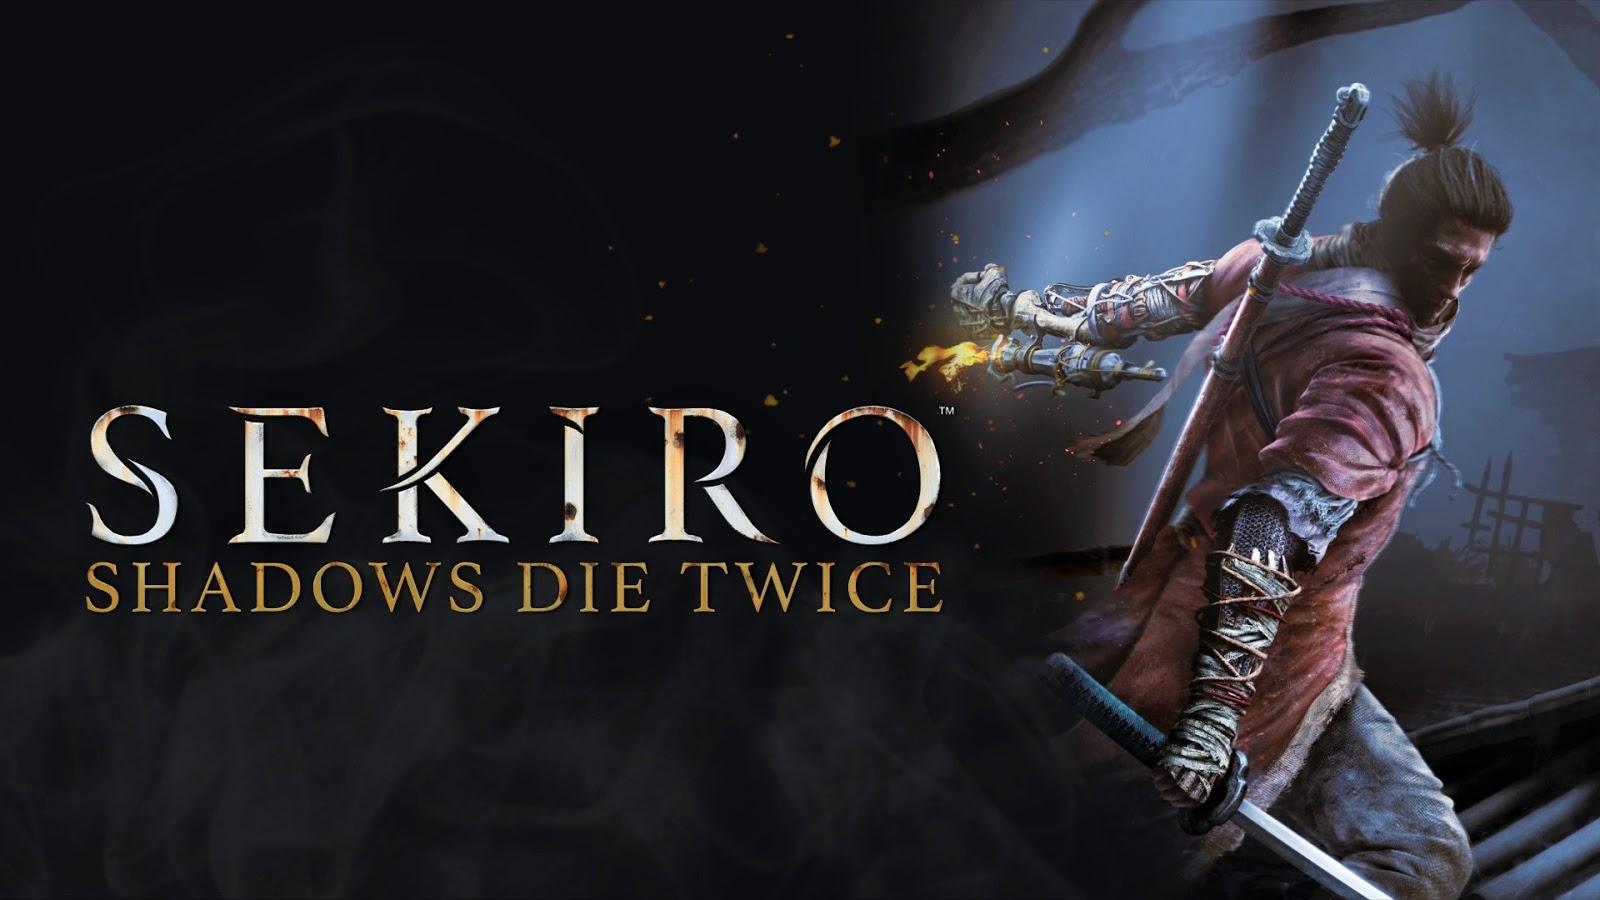 Sekiro: Shadows Die Twice v1 02 + Bonus Content - FitGirl Repack